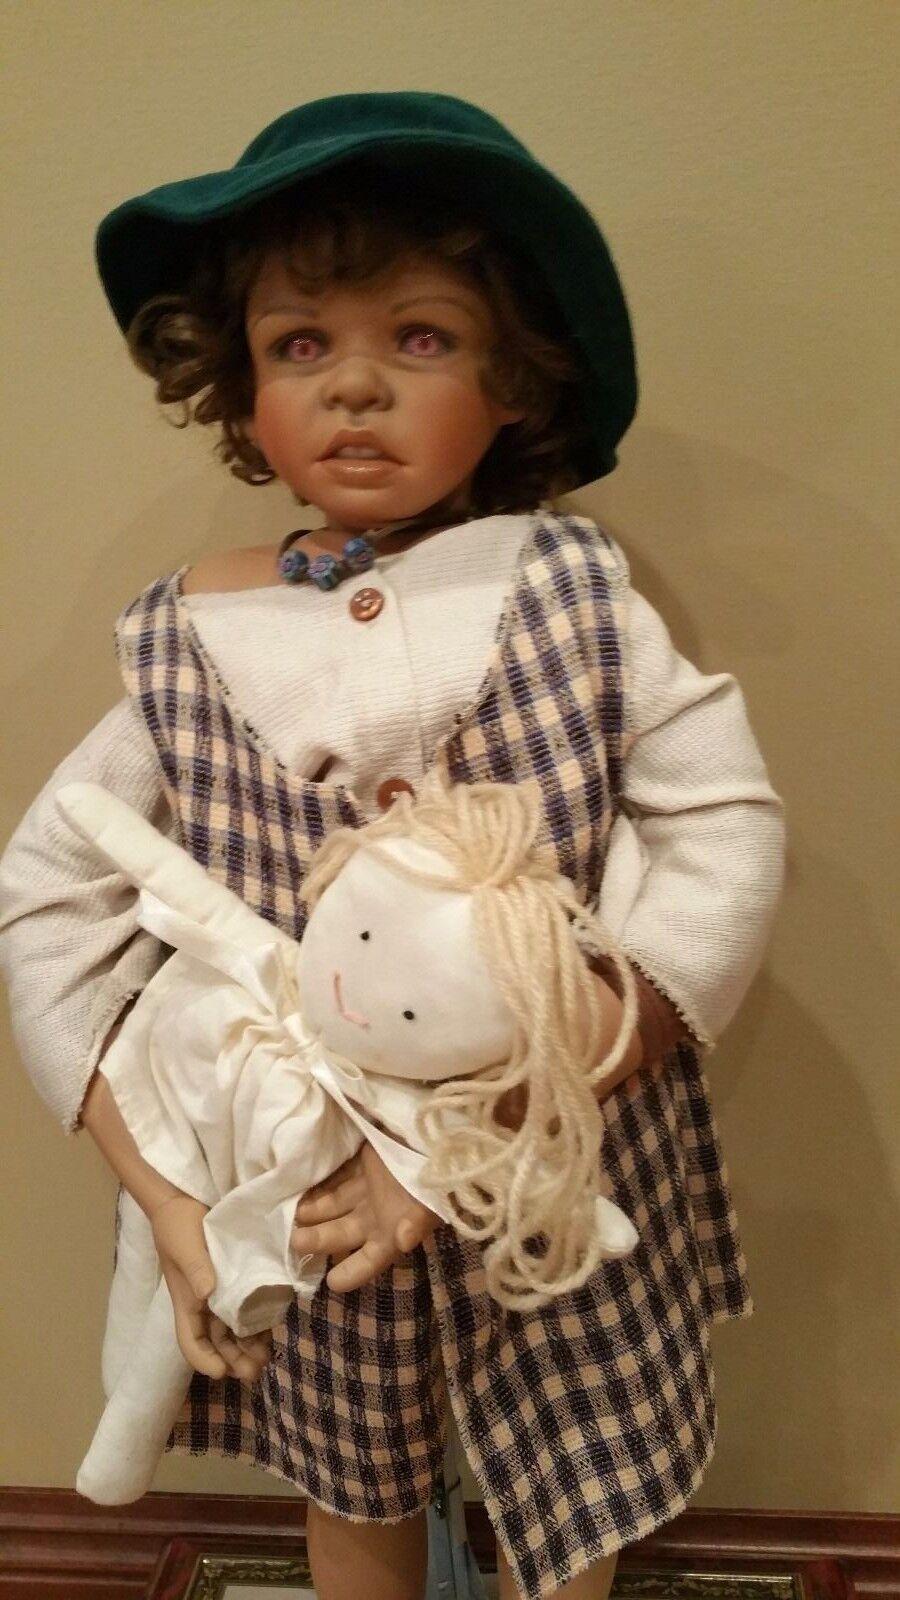 Kaye Wiggs 26   Doll with stuffed doll 1997 189 3000